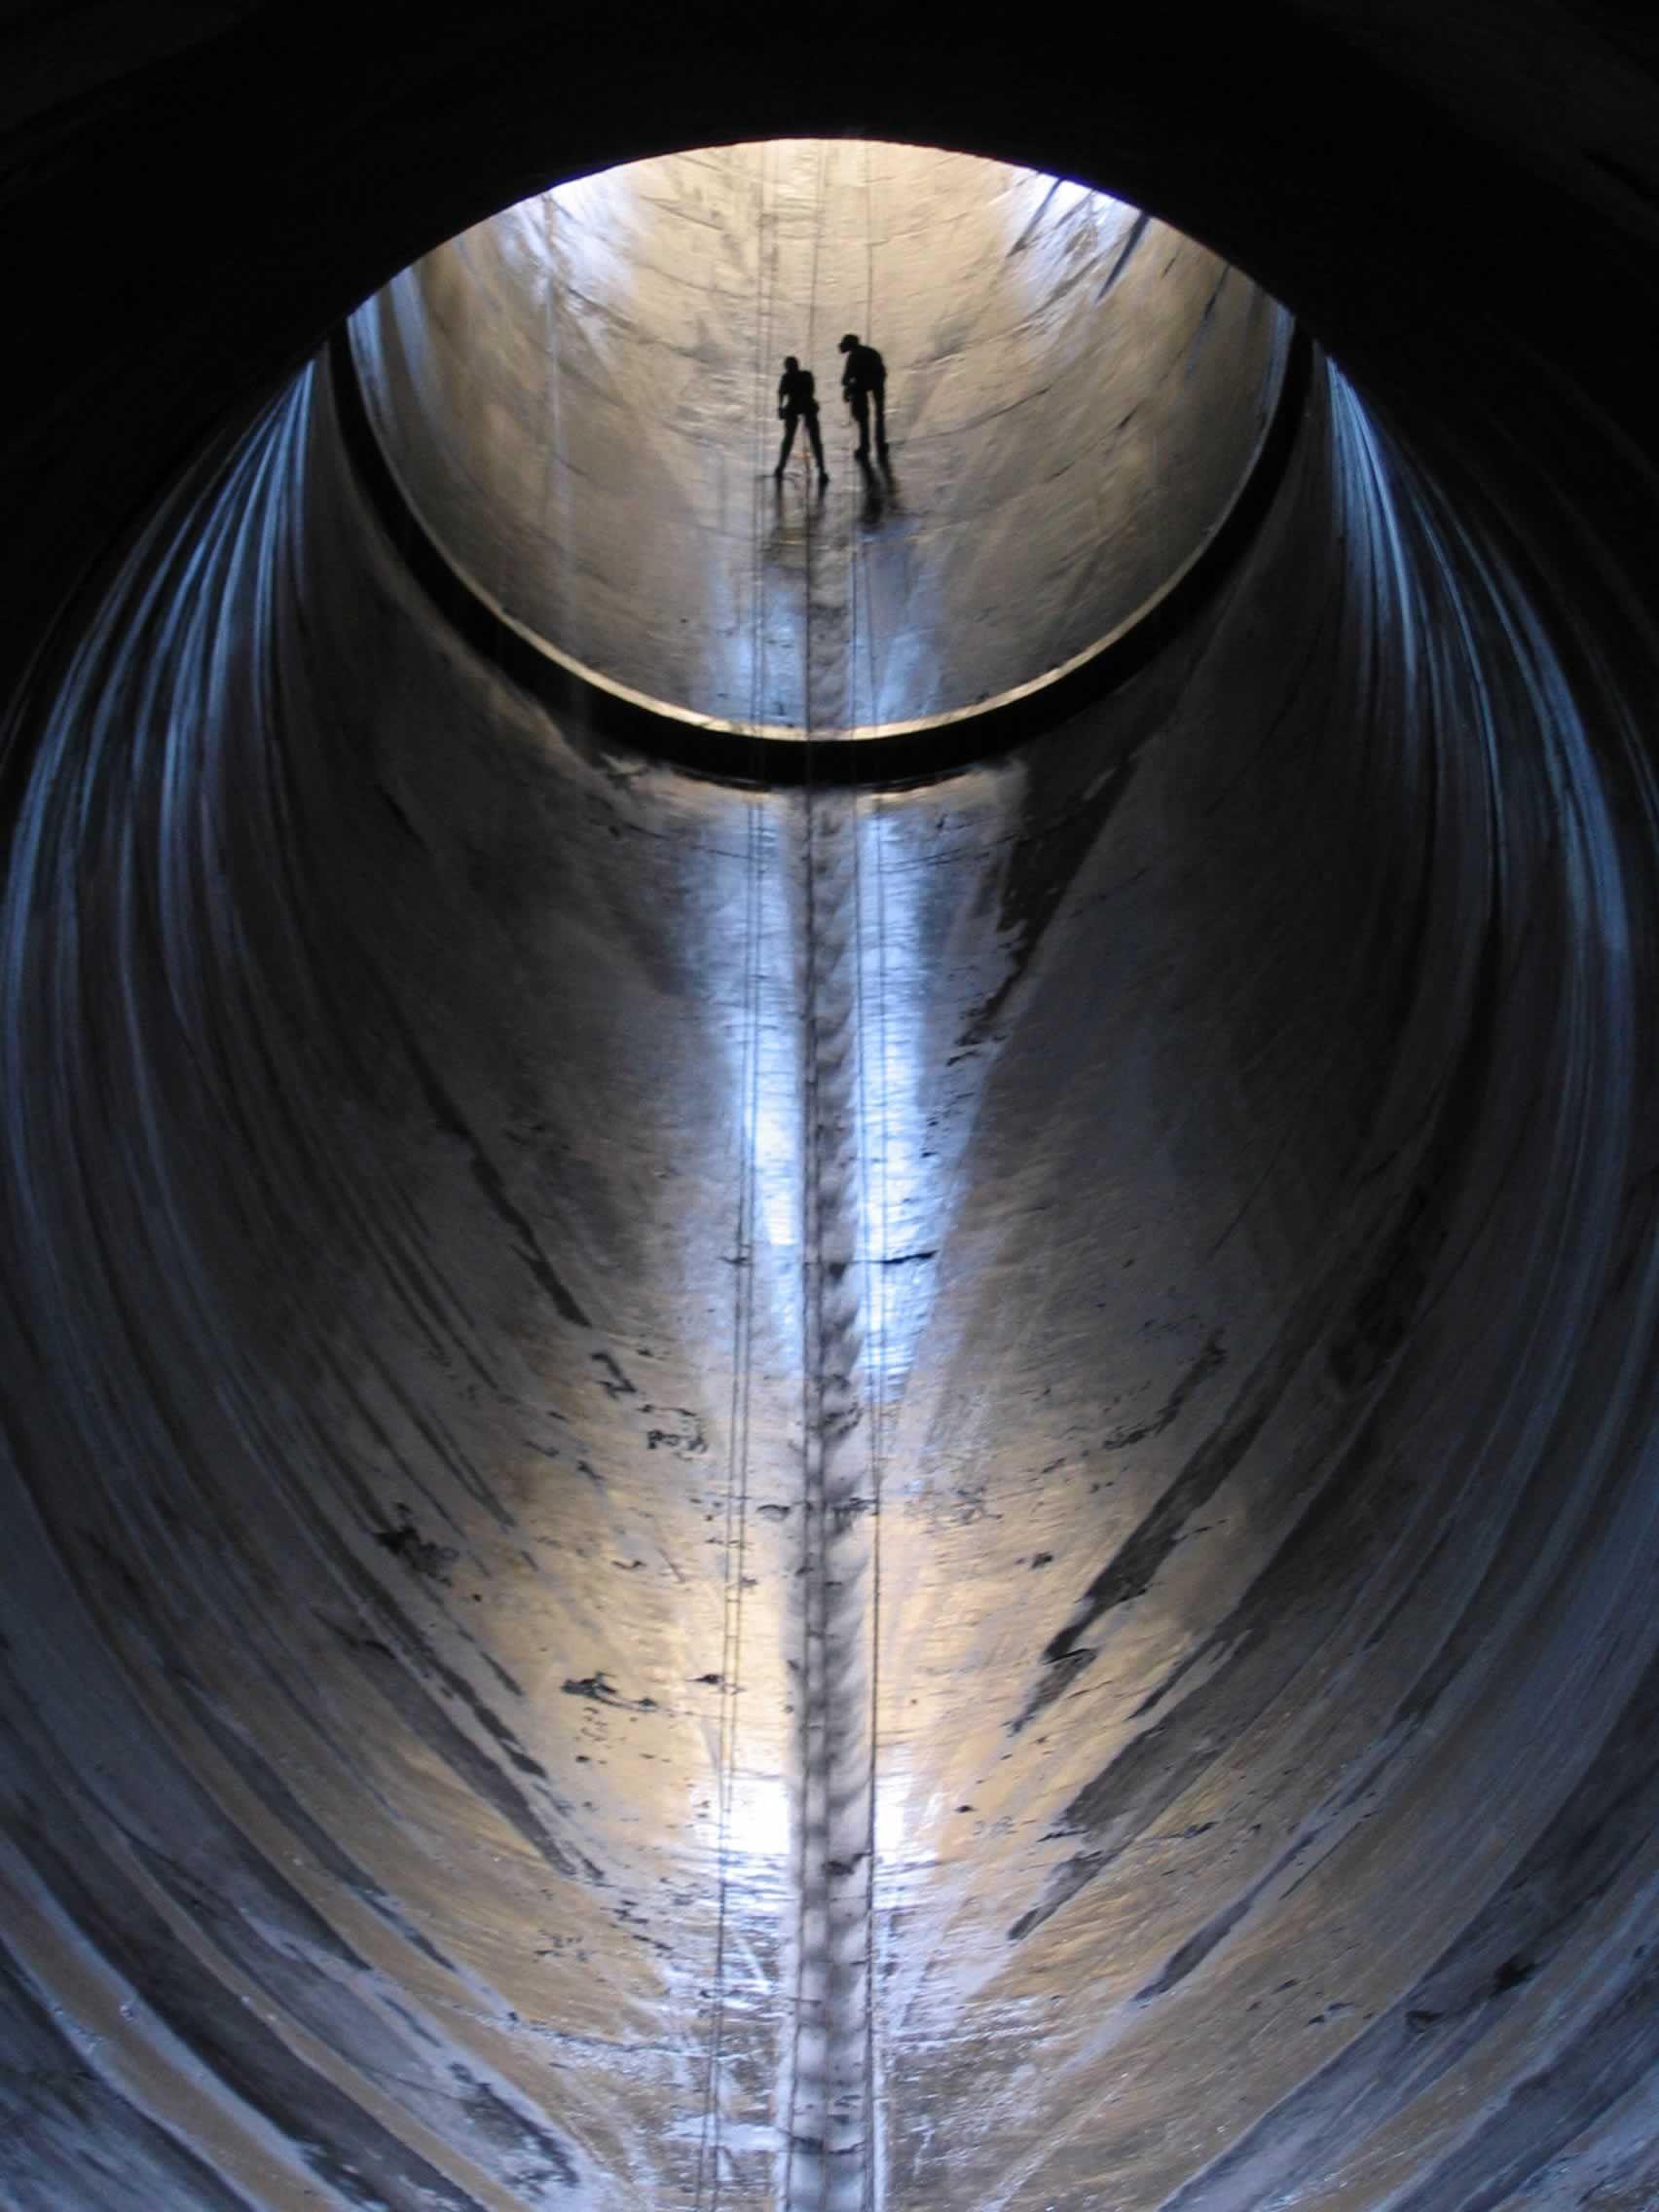 Pin by Xiao Yang on spillway / ダム穴 / Reservoir / dam